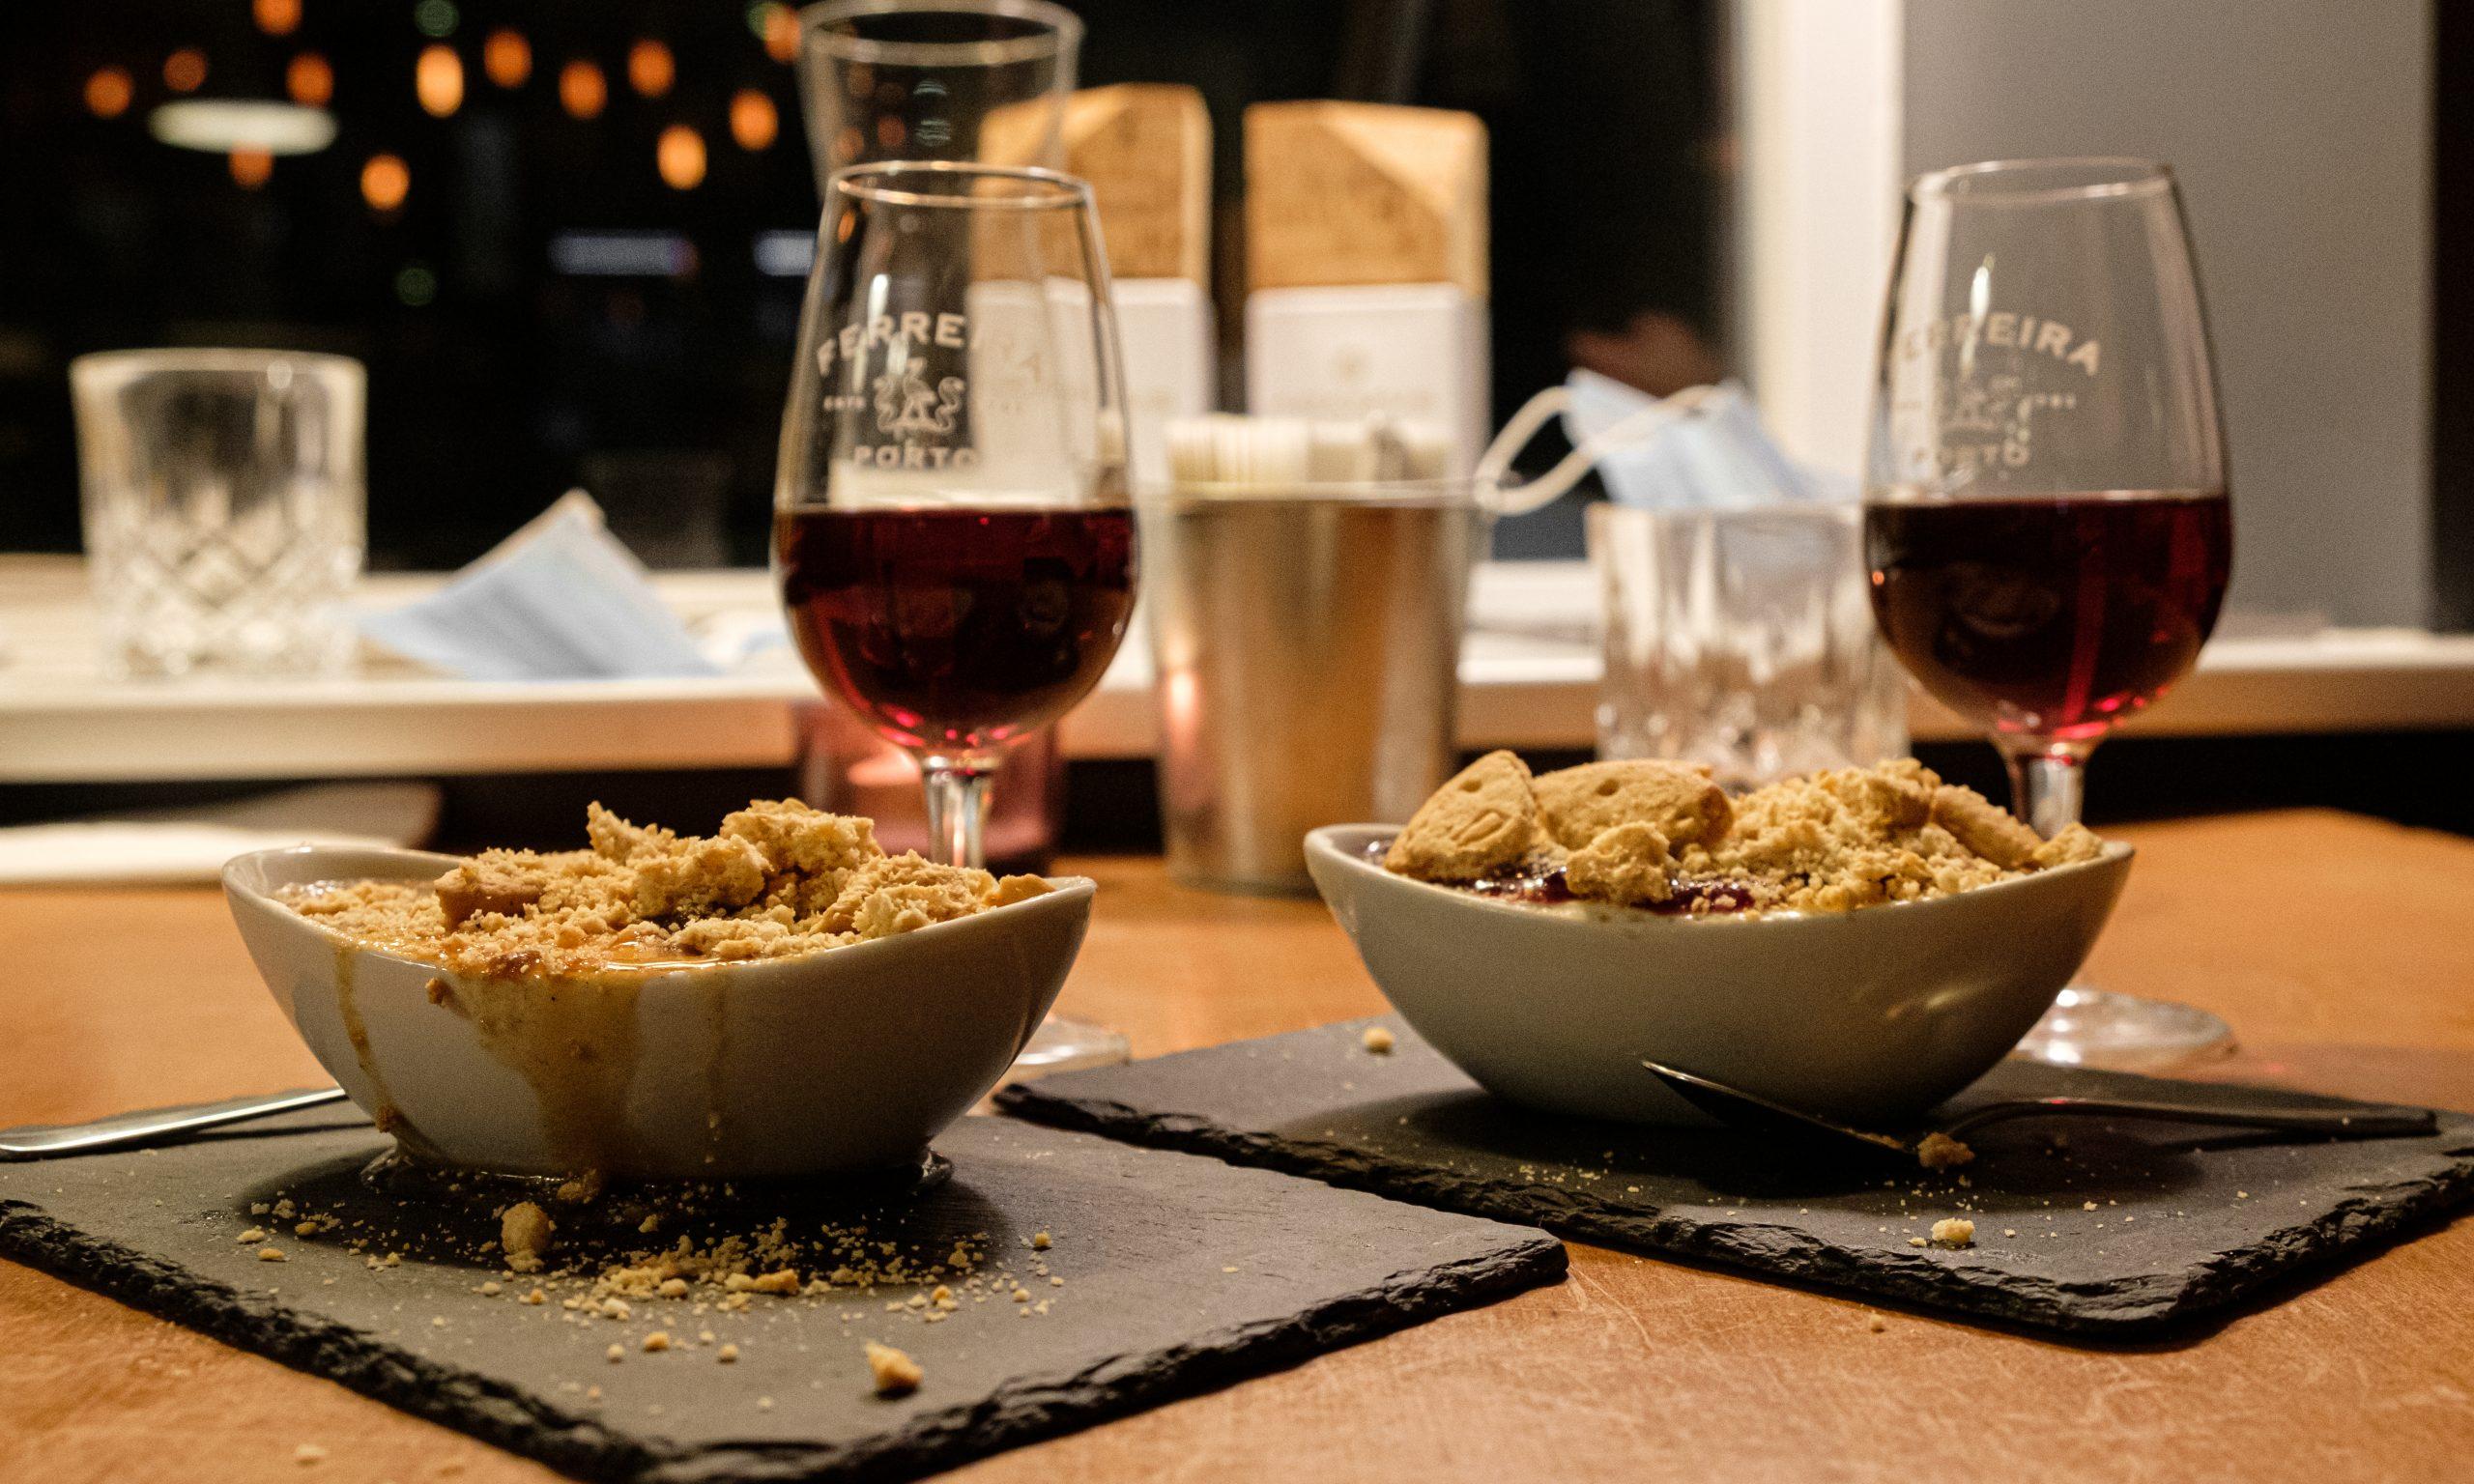 Fra italienske til indiske specialiteter: Her kommer du Jorden Rundt på Aalborgs madscene